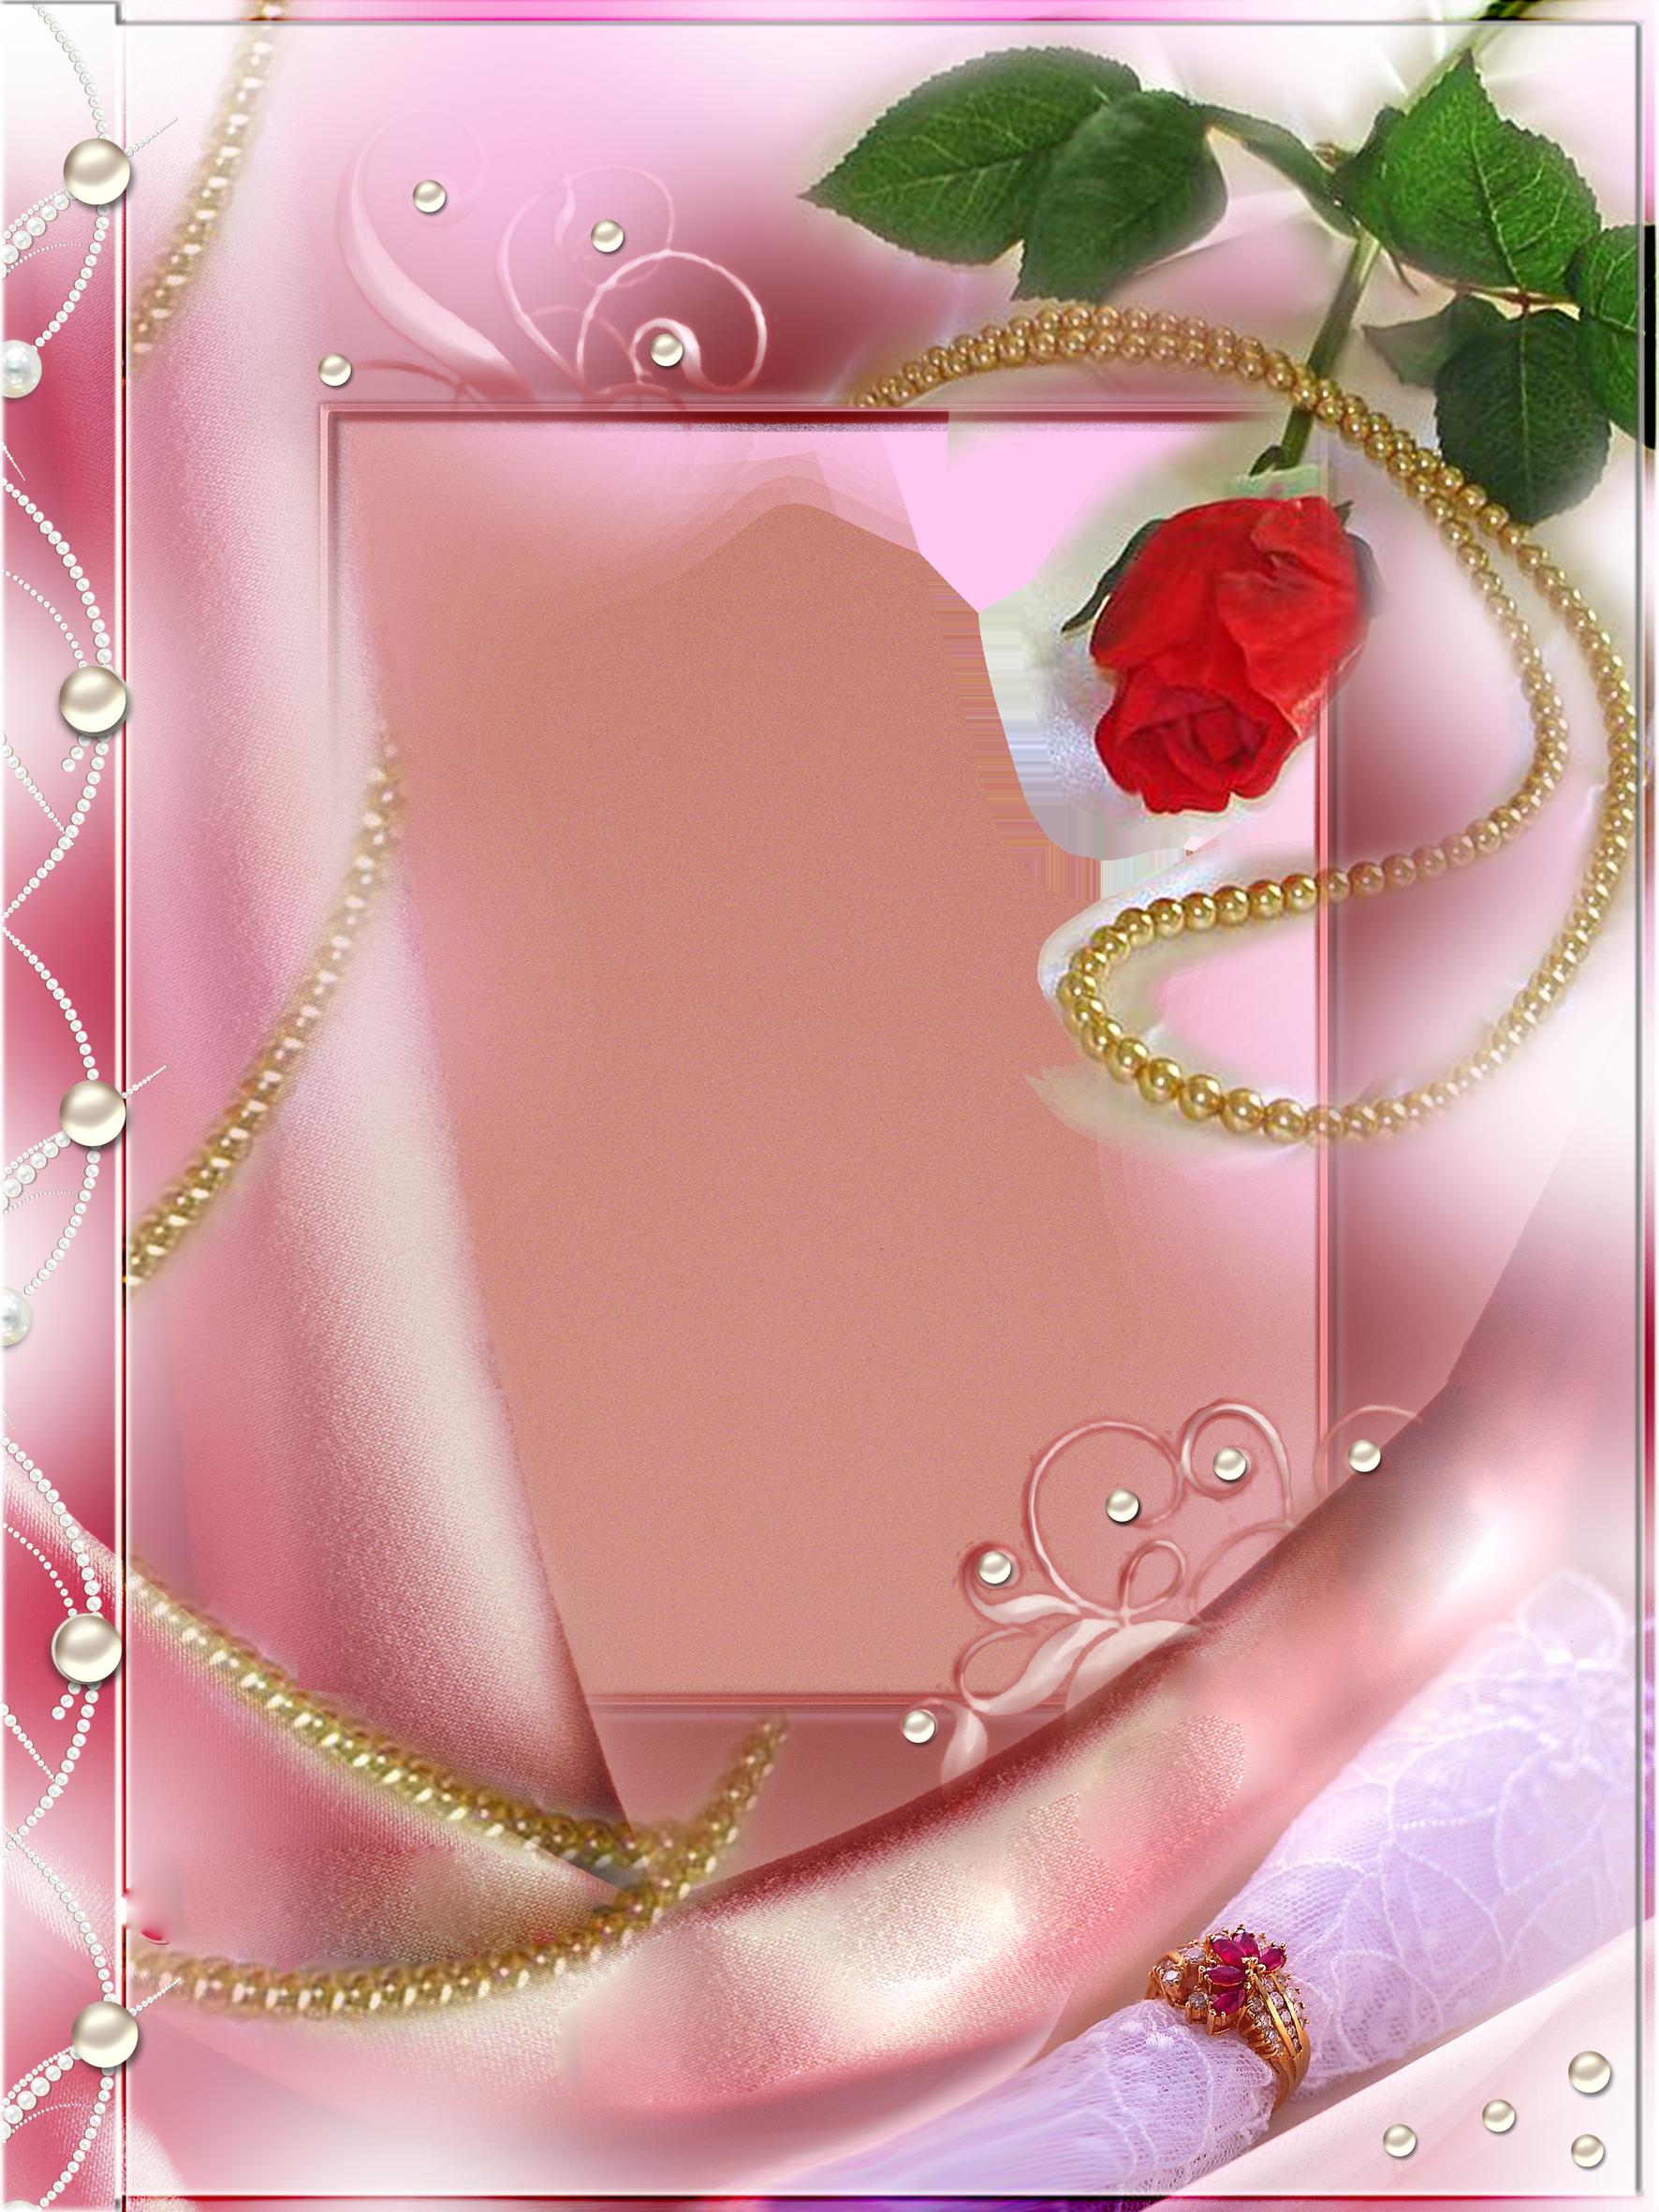 pink printable frame 300 dpi resolution free image